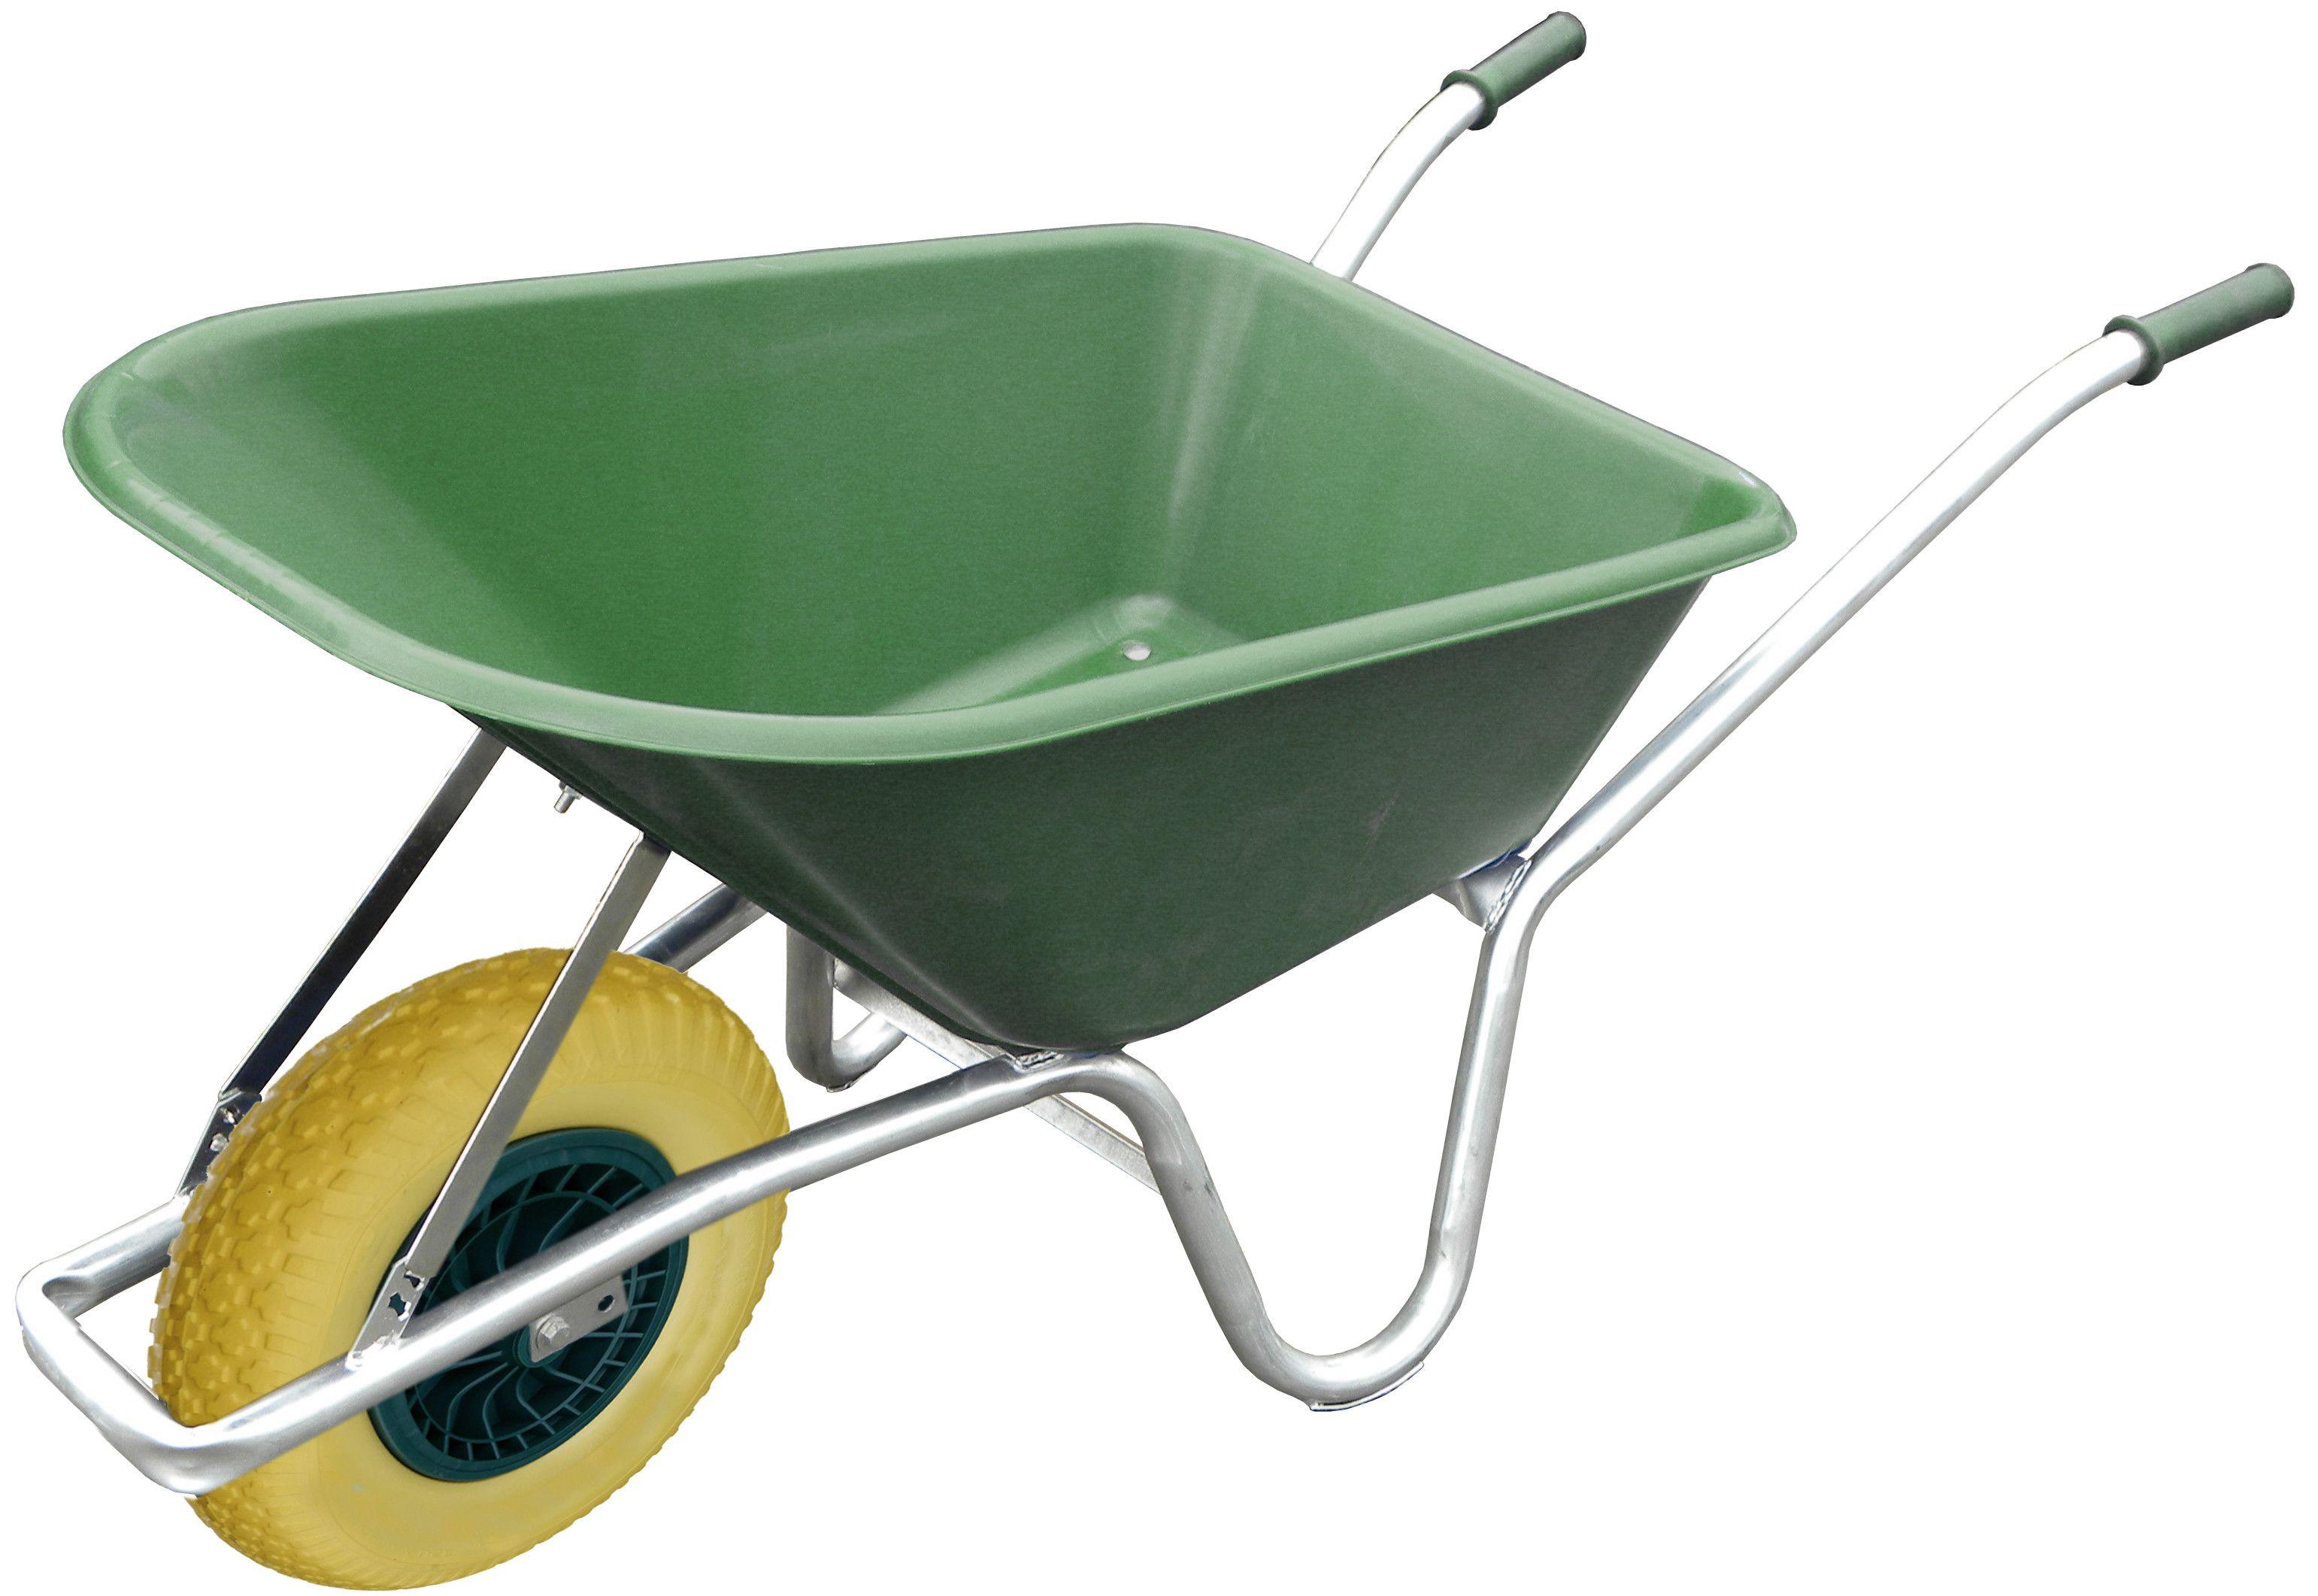 100L Green Wheelbarrow With Flat Proof Wheel